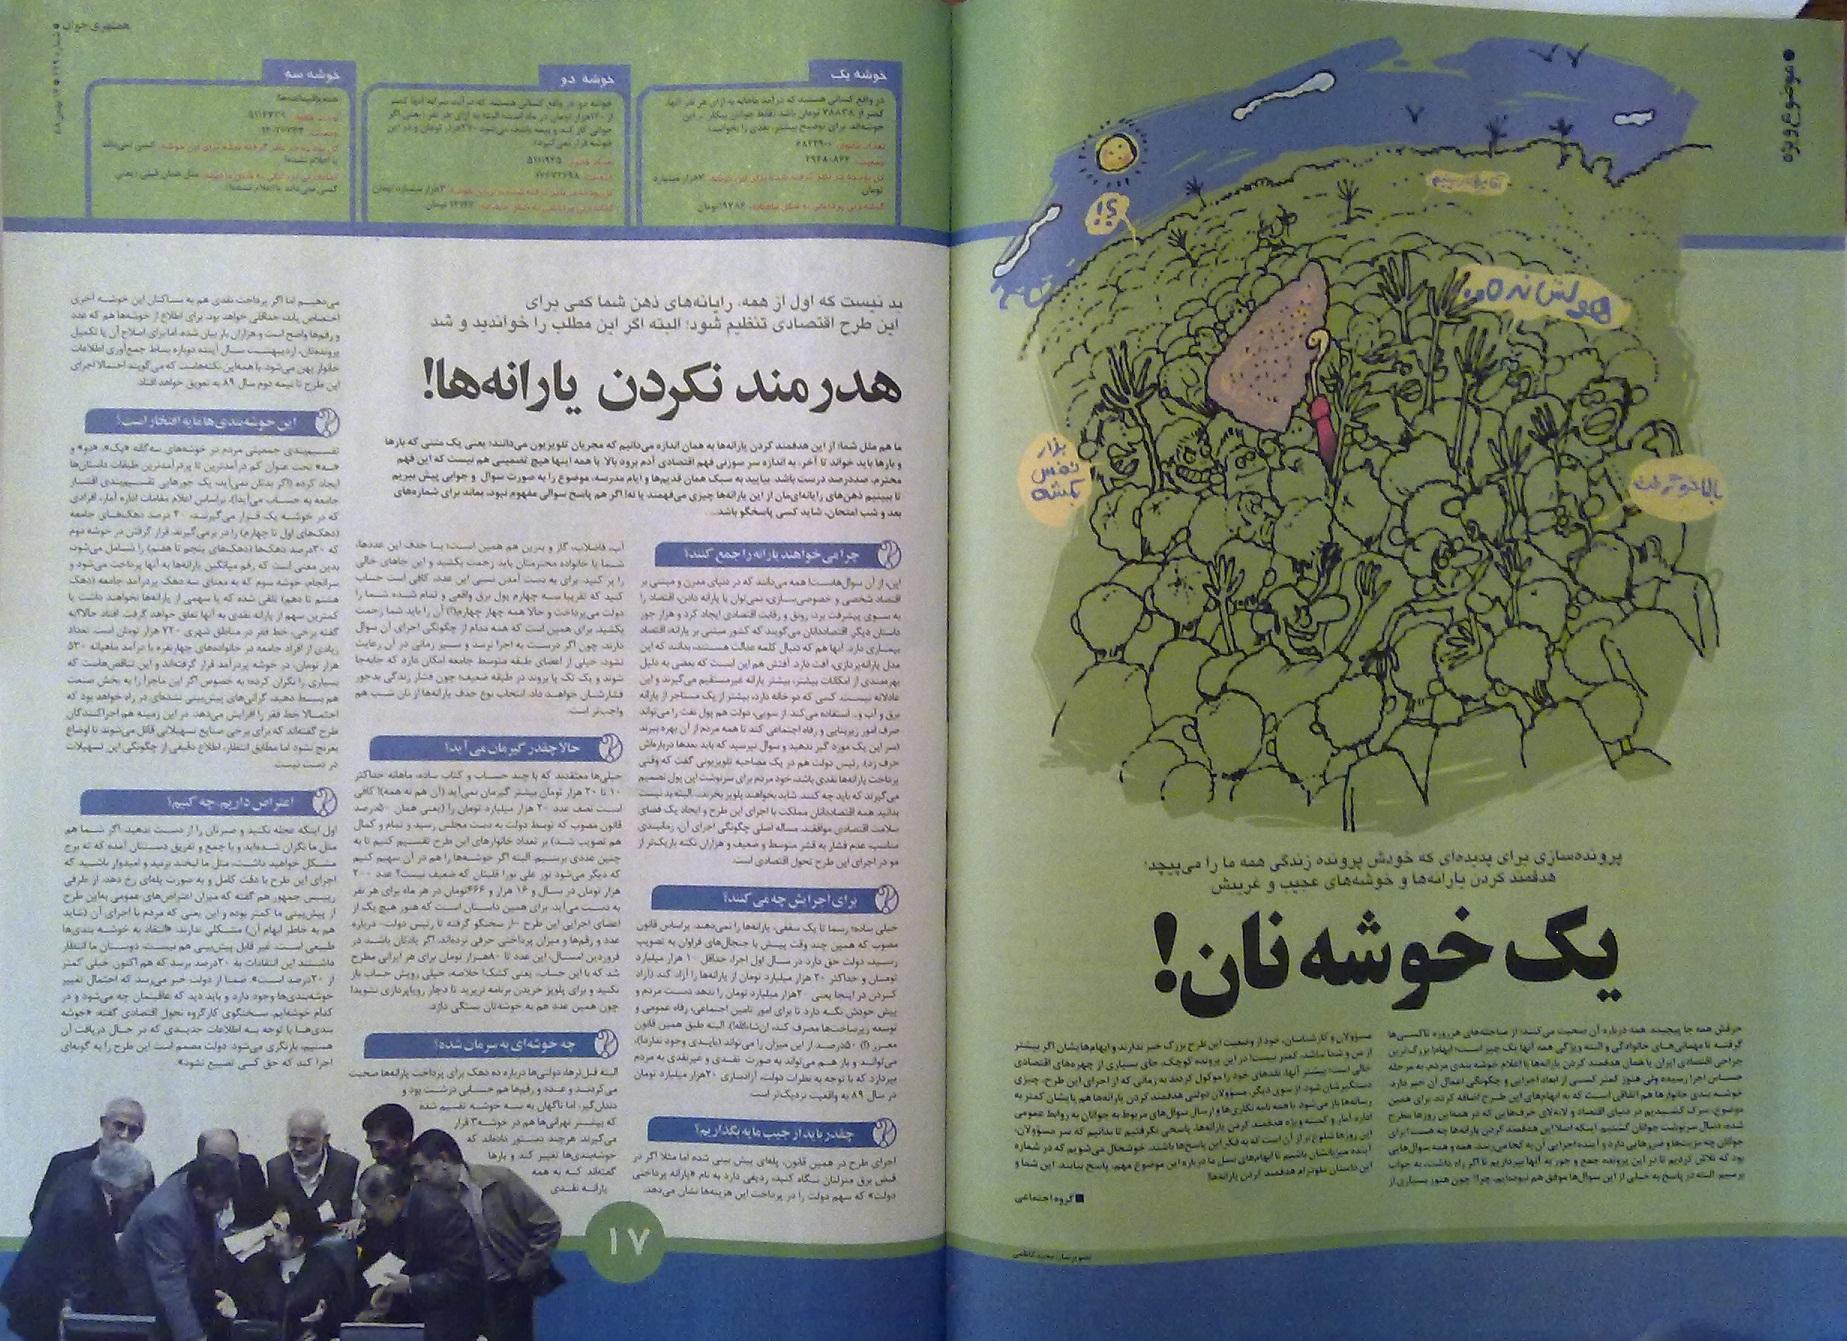 http://hadihossein.persiangig.com/image/20100207082.jpg